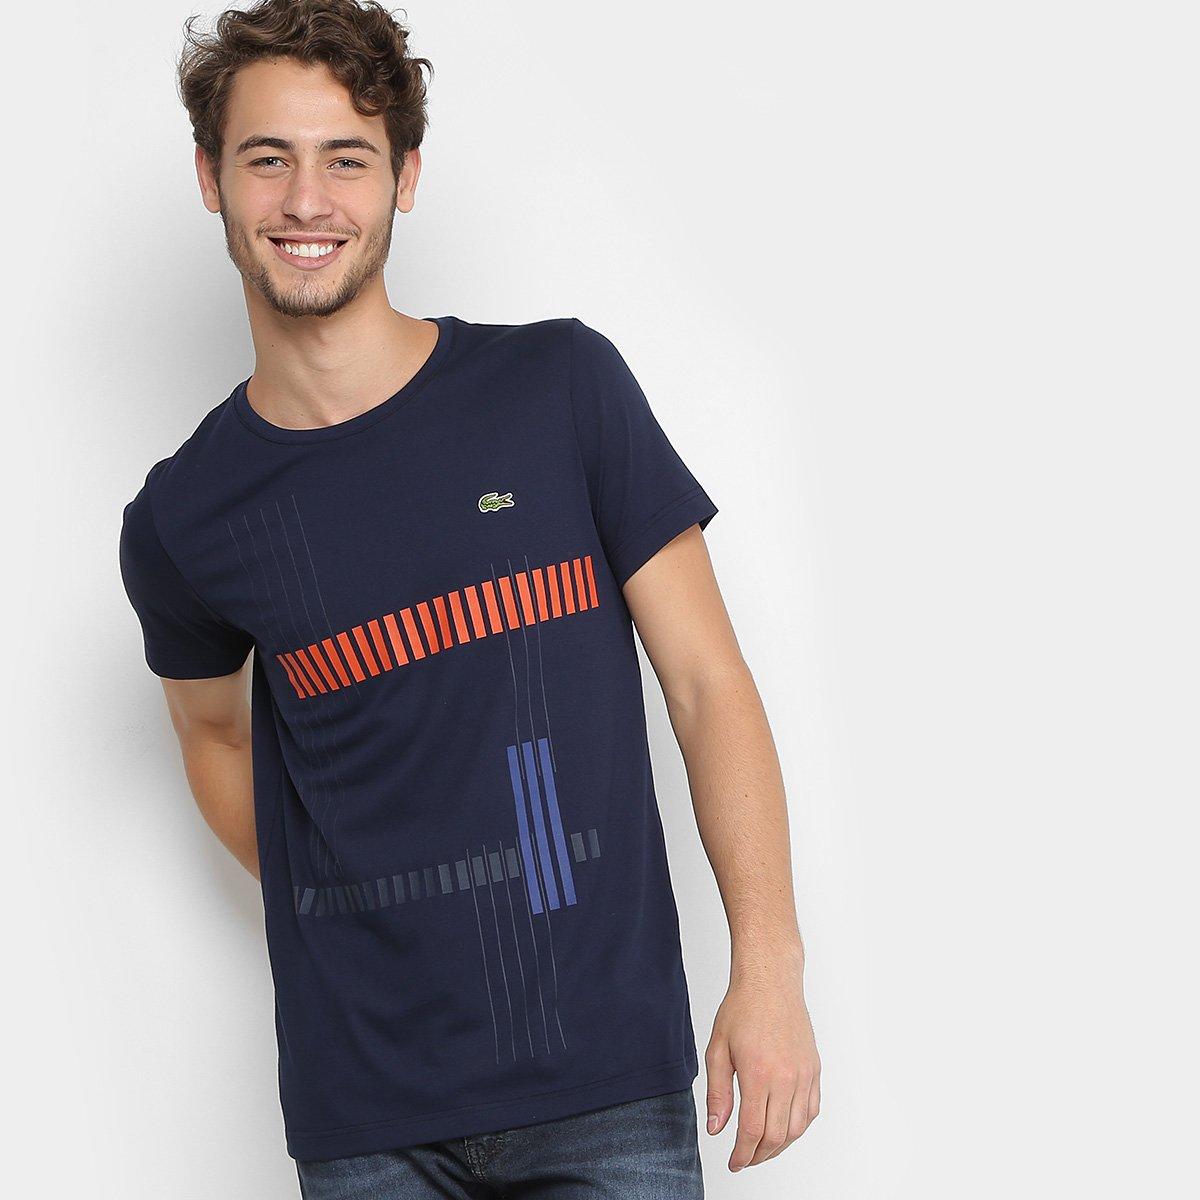 001ea11d83b21 Camiseta Lacoste Sport Tennis Listrada Masculina - Compre Agora ...